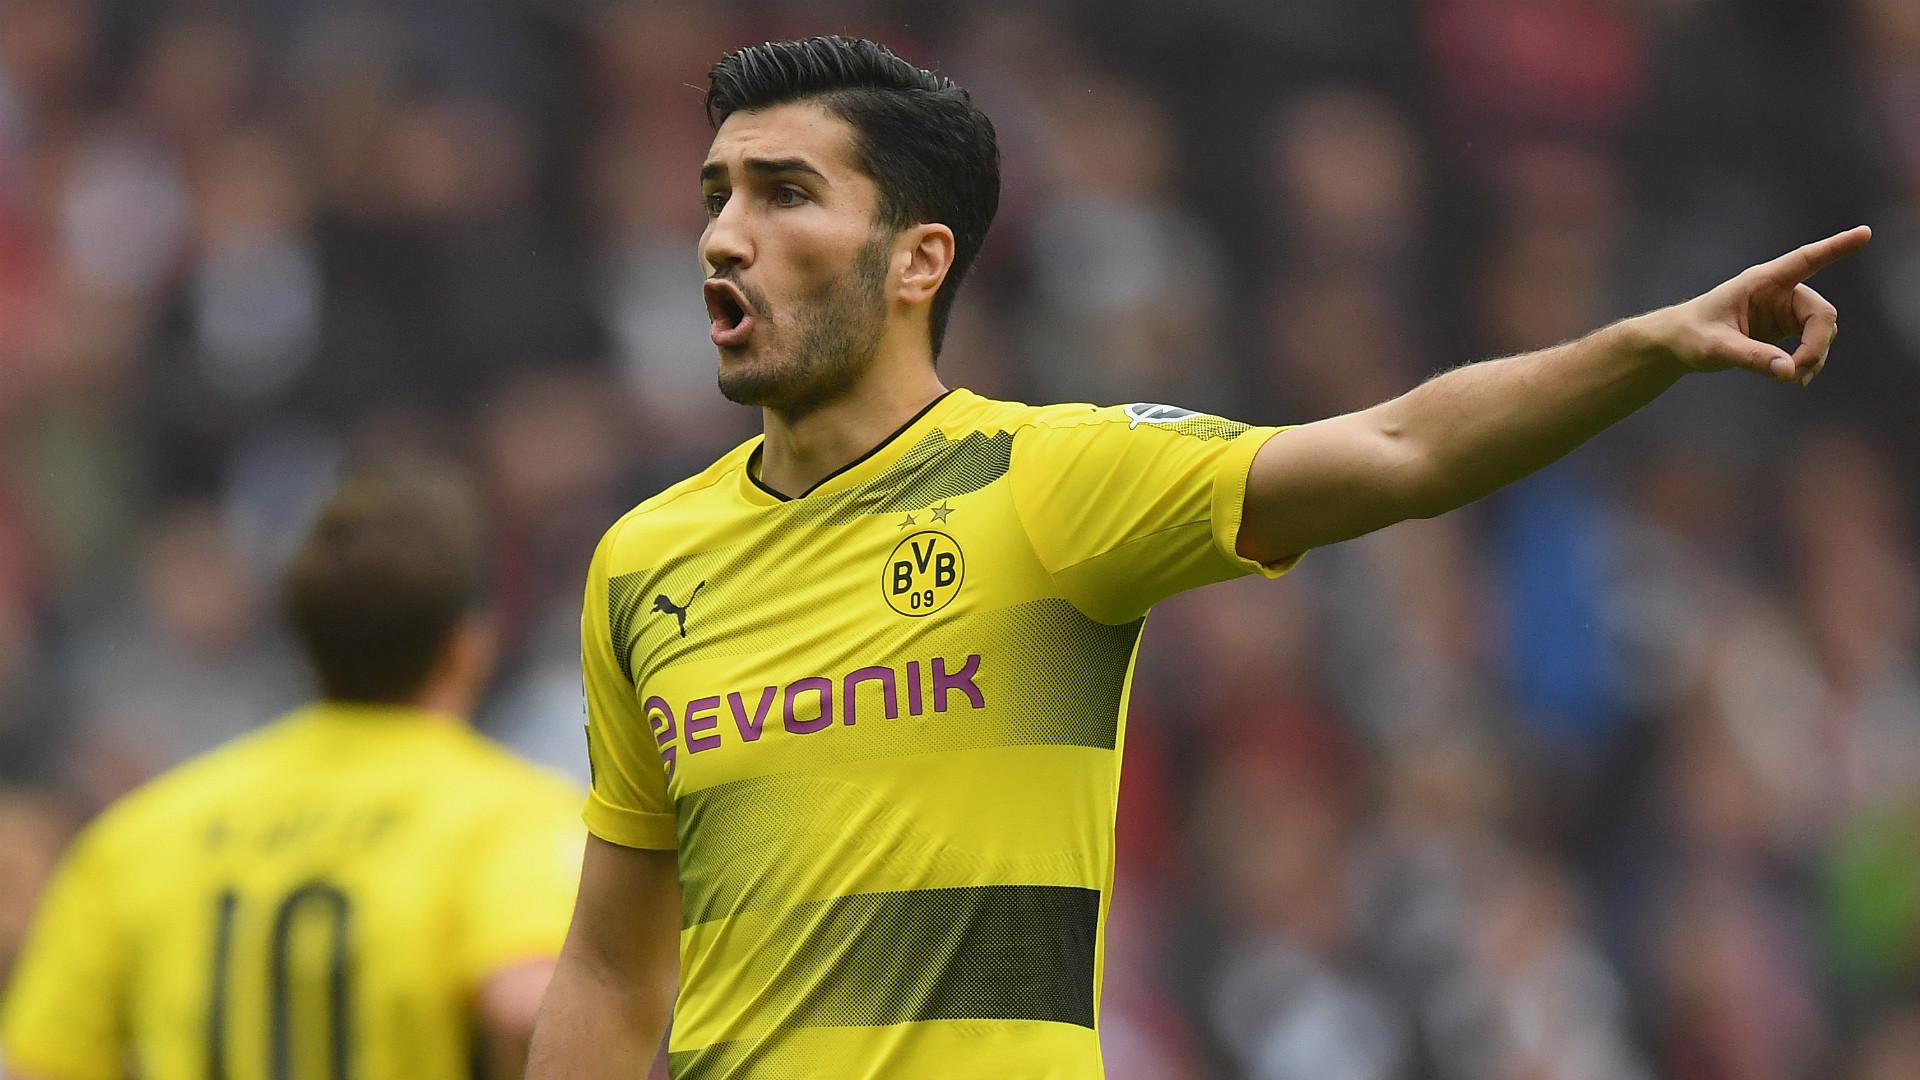 Bundesliga transfer news: Nuri Sahin leaves Borussia Dortmund for Werder  Bremen | Goal.com